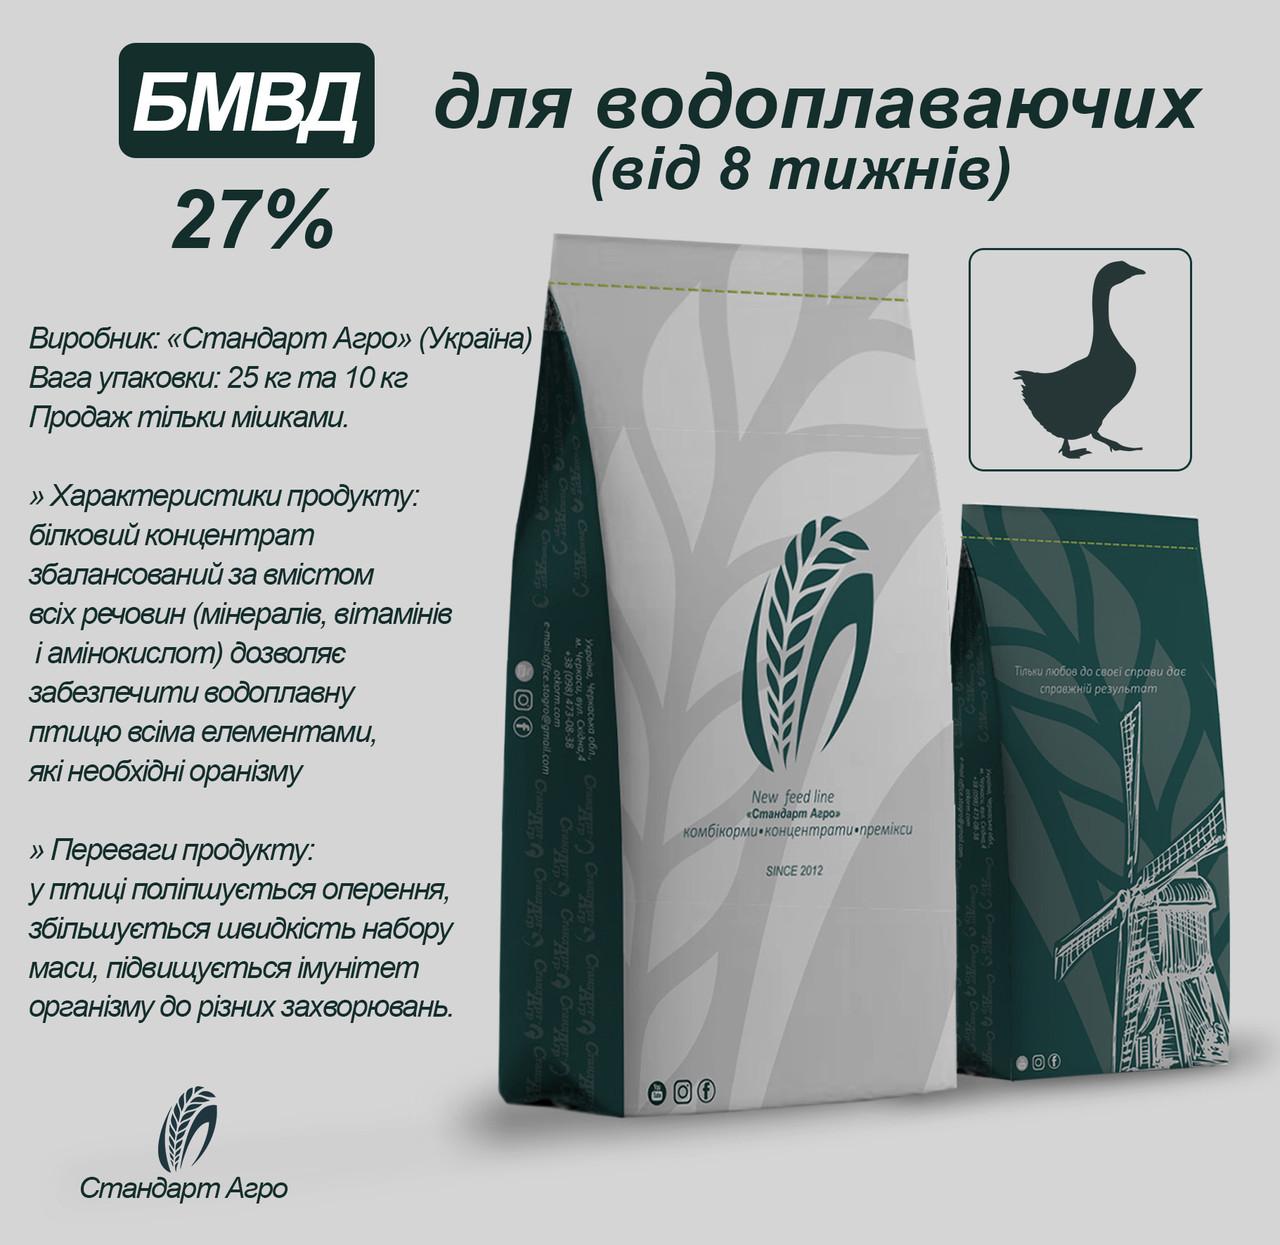 "БМВД водоплавающие 27% ТМ "" Стандарт Агро"" после 8 недель"